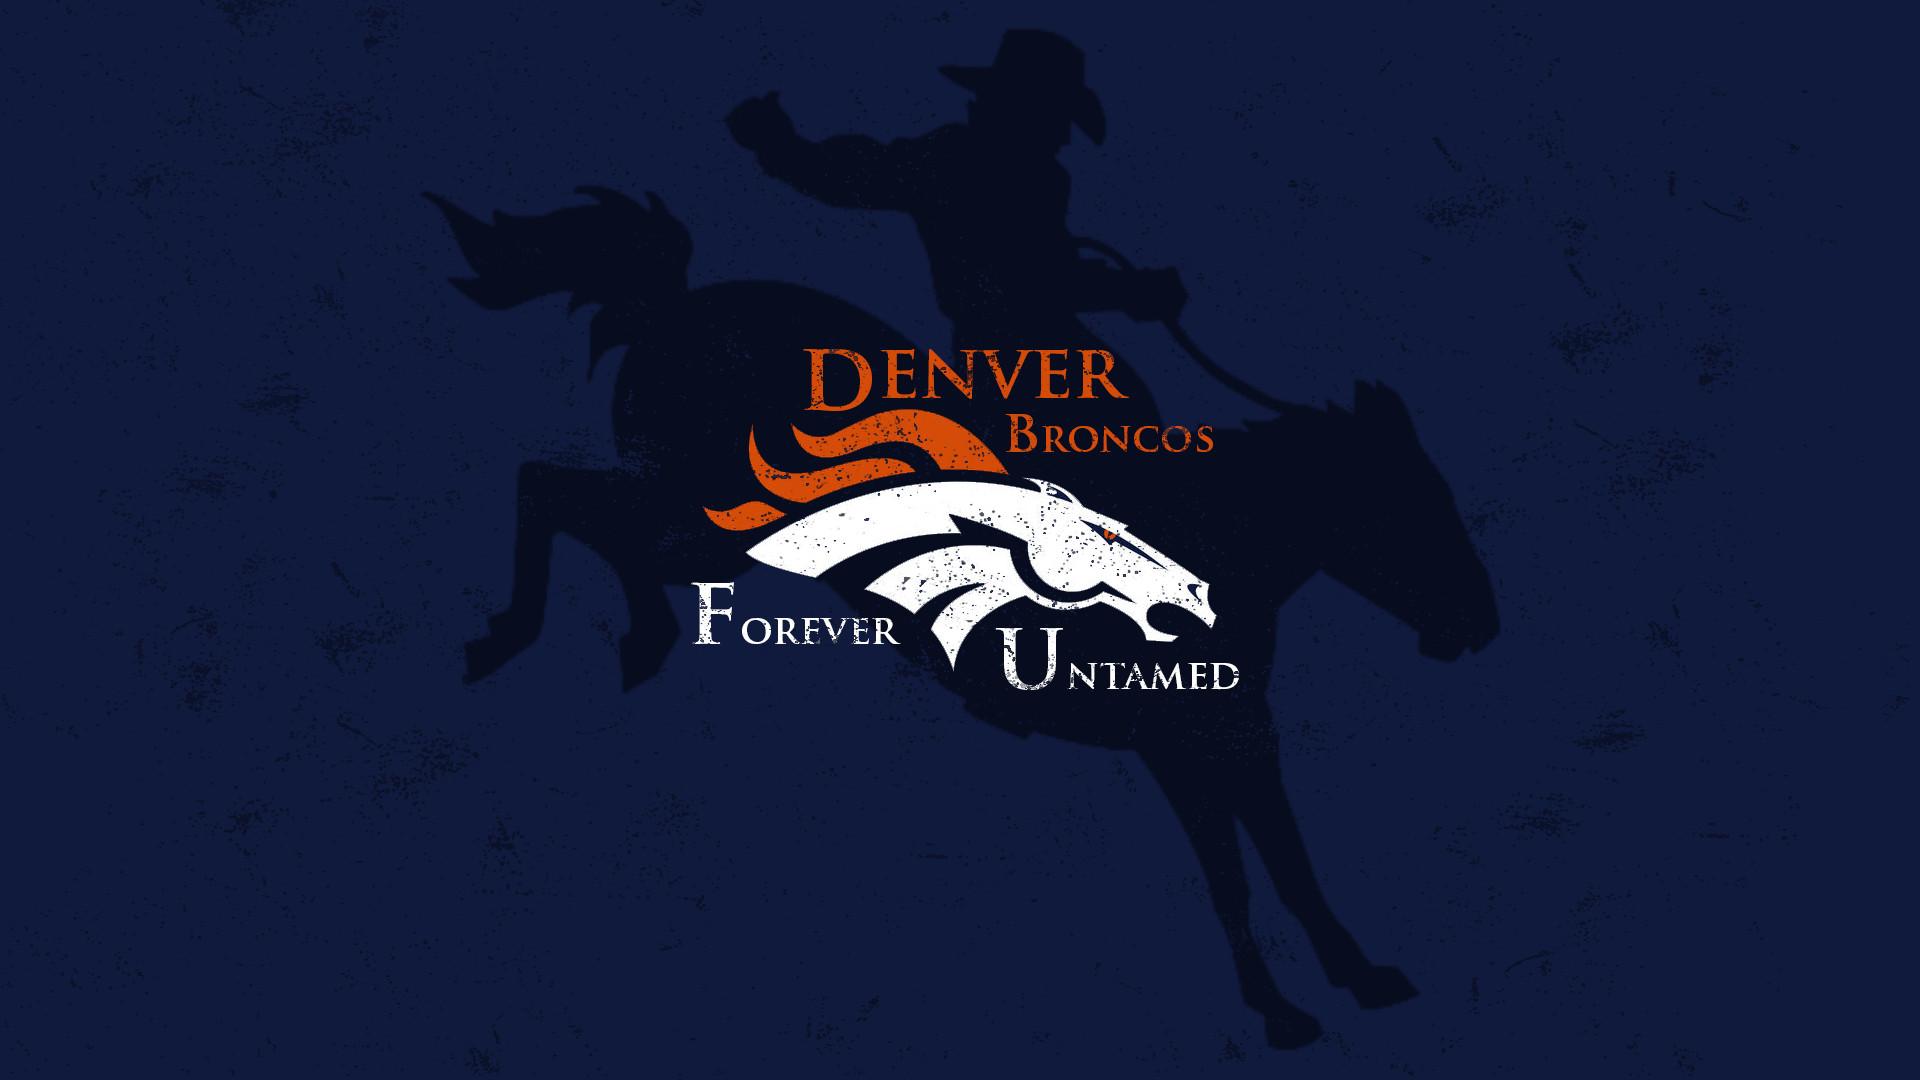 Denver broncos desktop wallpaper wallpapersafari denver broncos football logo hd desktop wallpaper 1920x1080 voltagebd Gallery